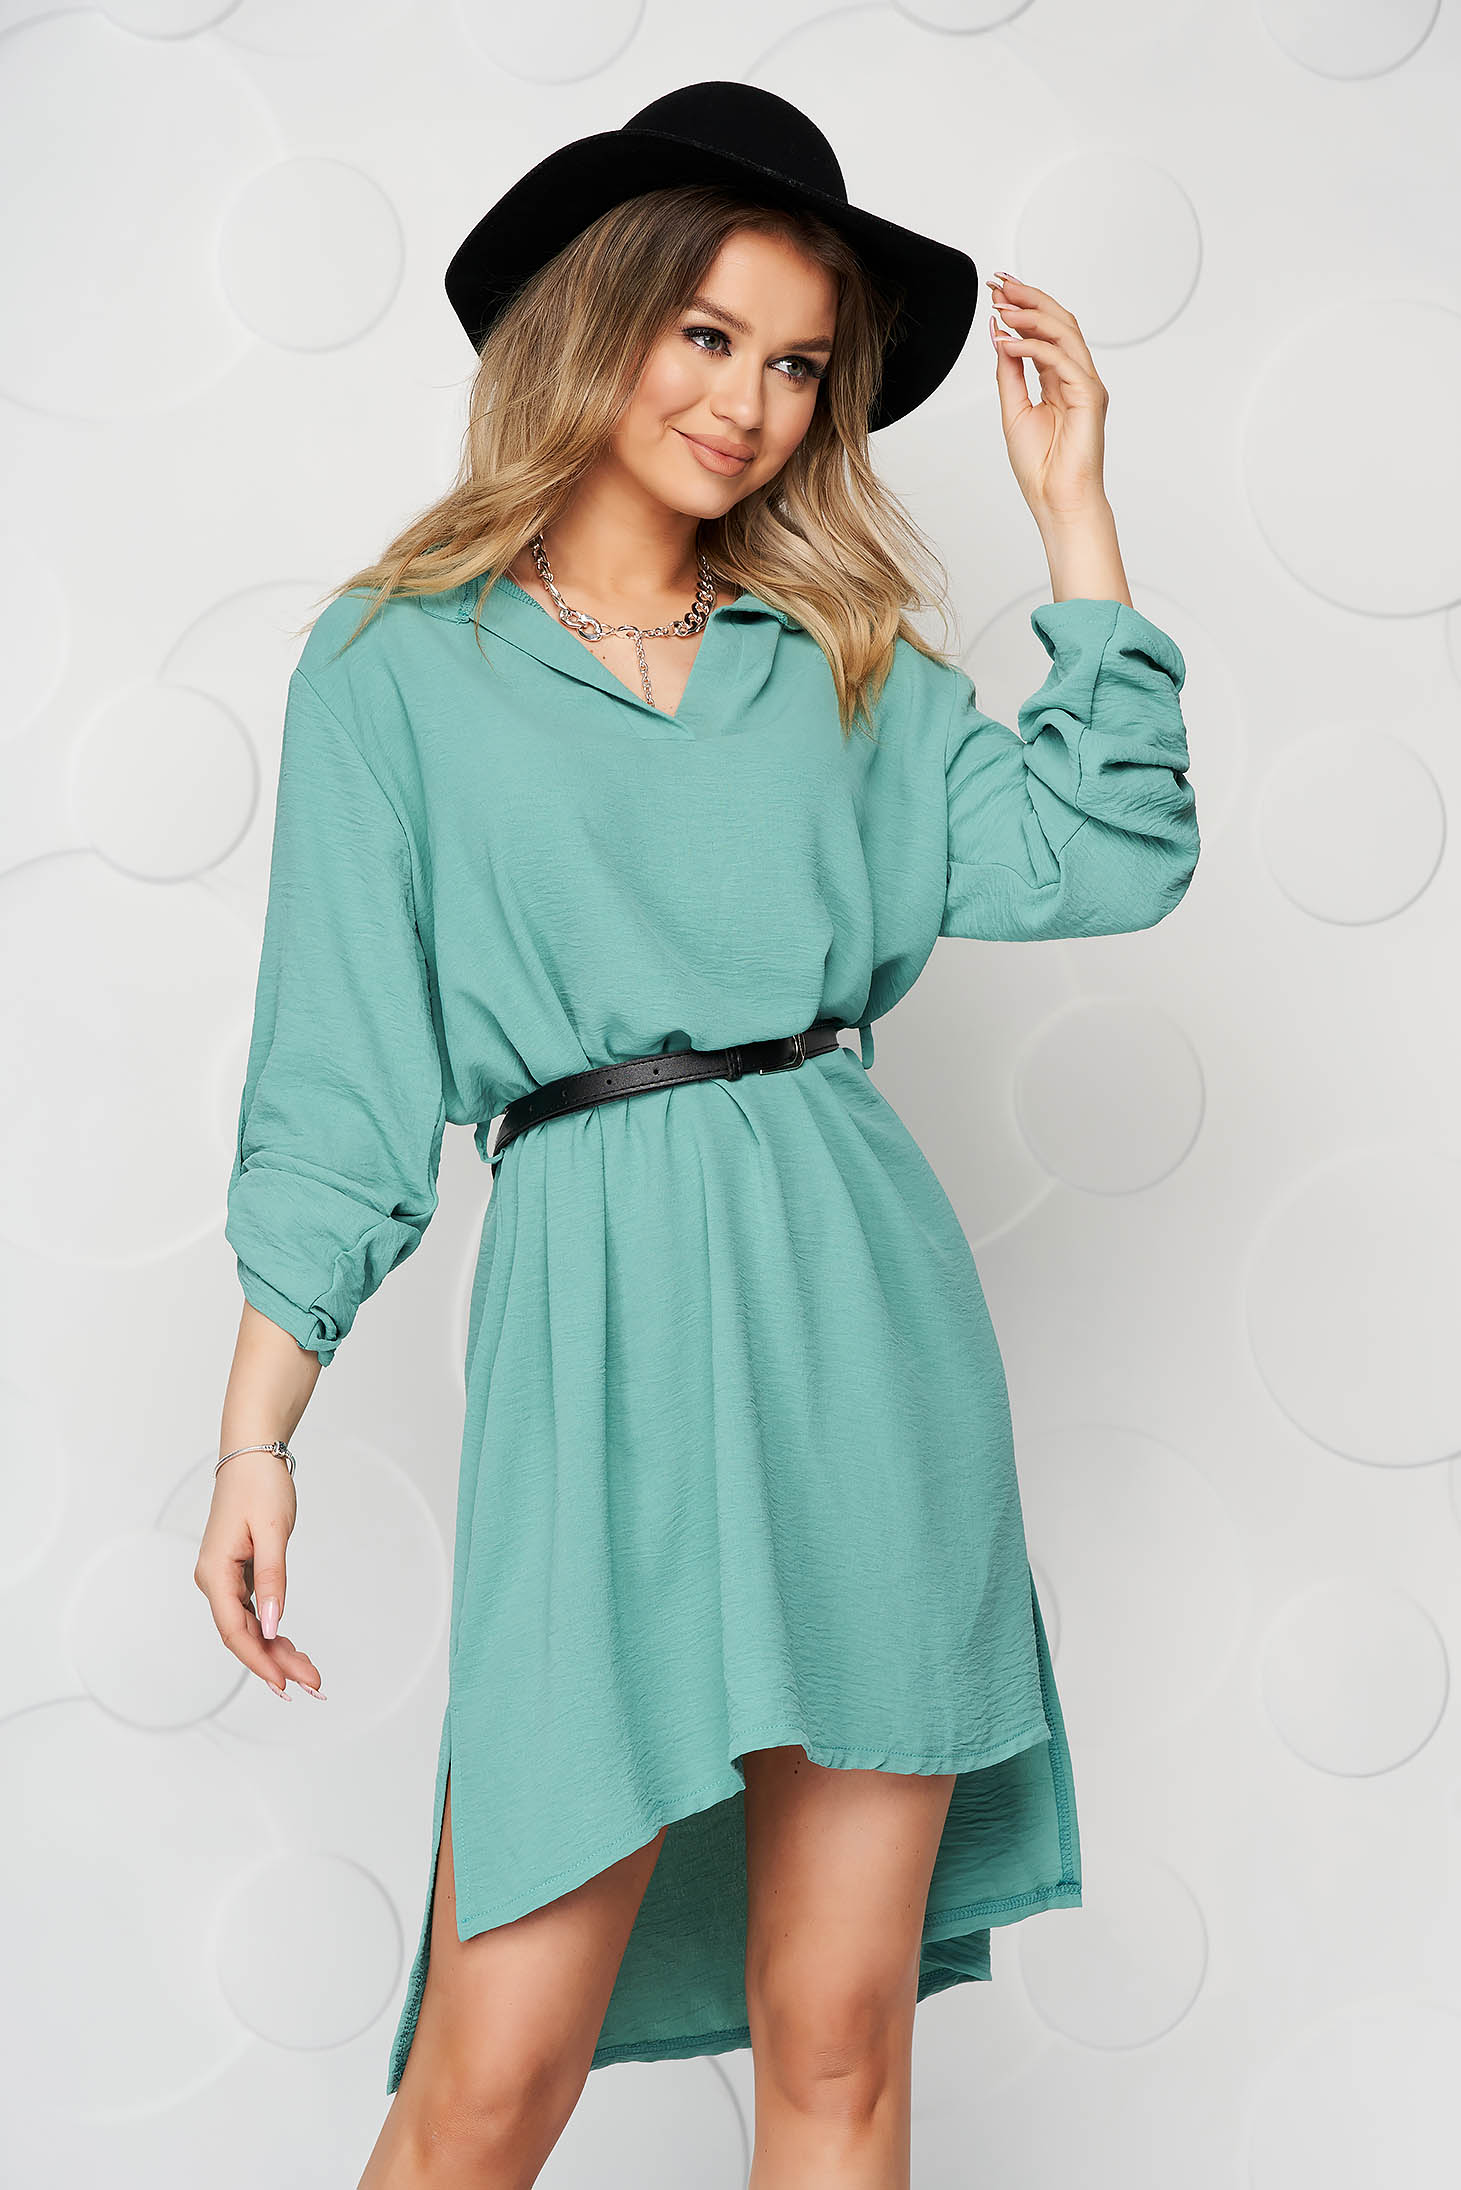 Rochie tip camasa verde-deschis scurta de zi cu un croi drept din material subtire